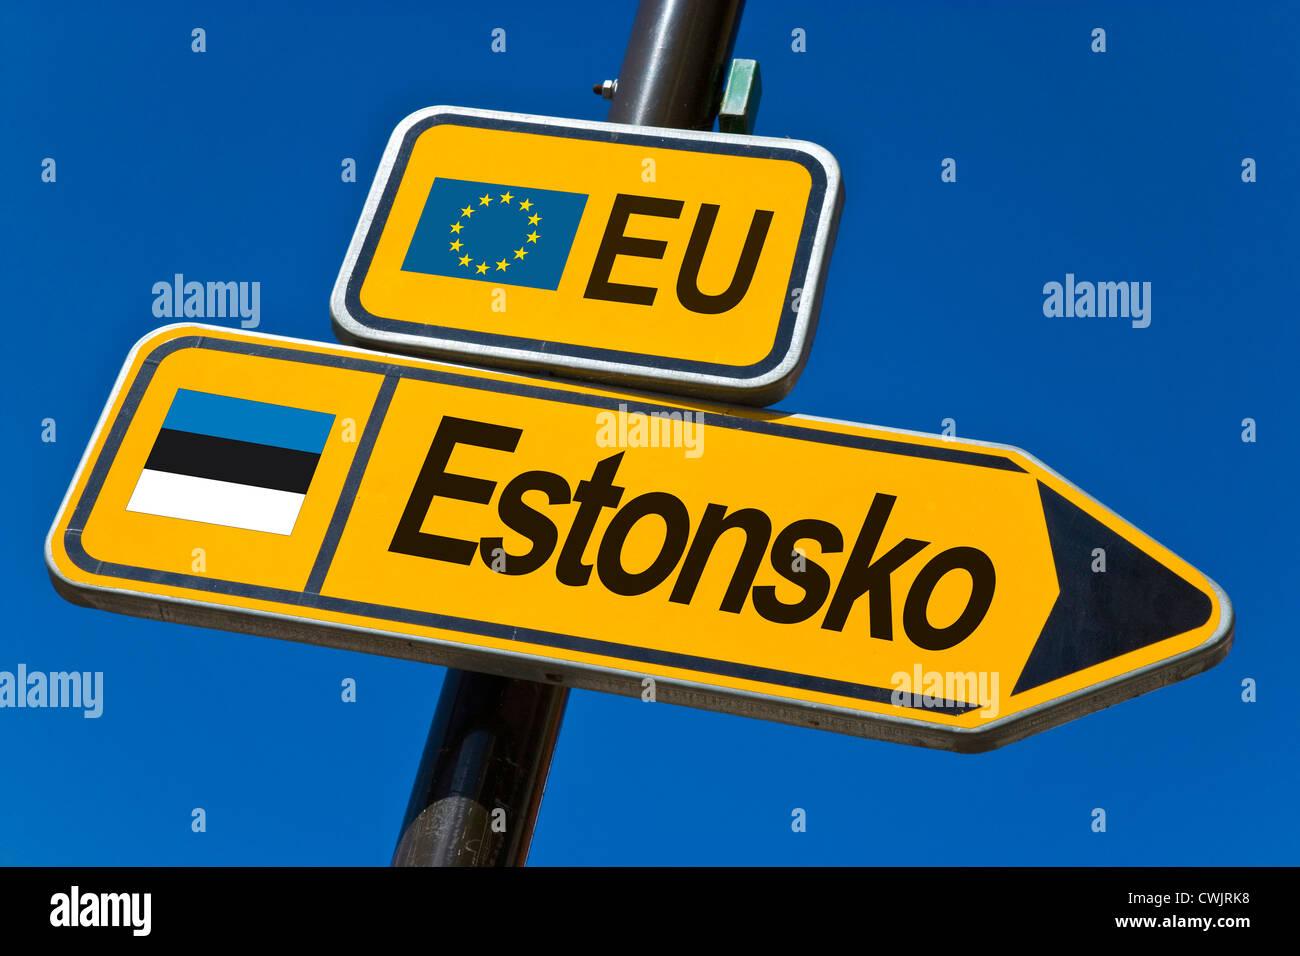 European Union and flag of Estonia - Stock Image